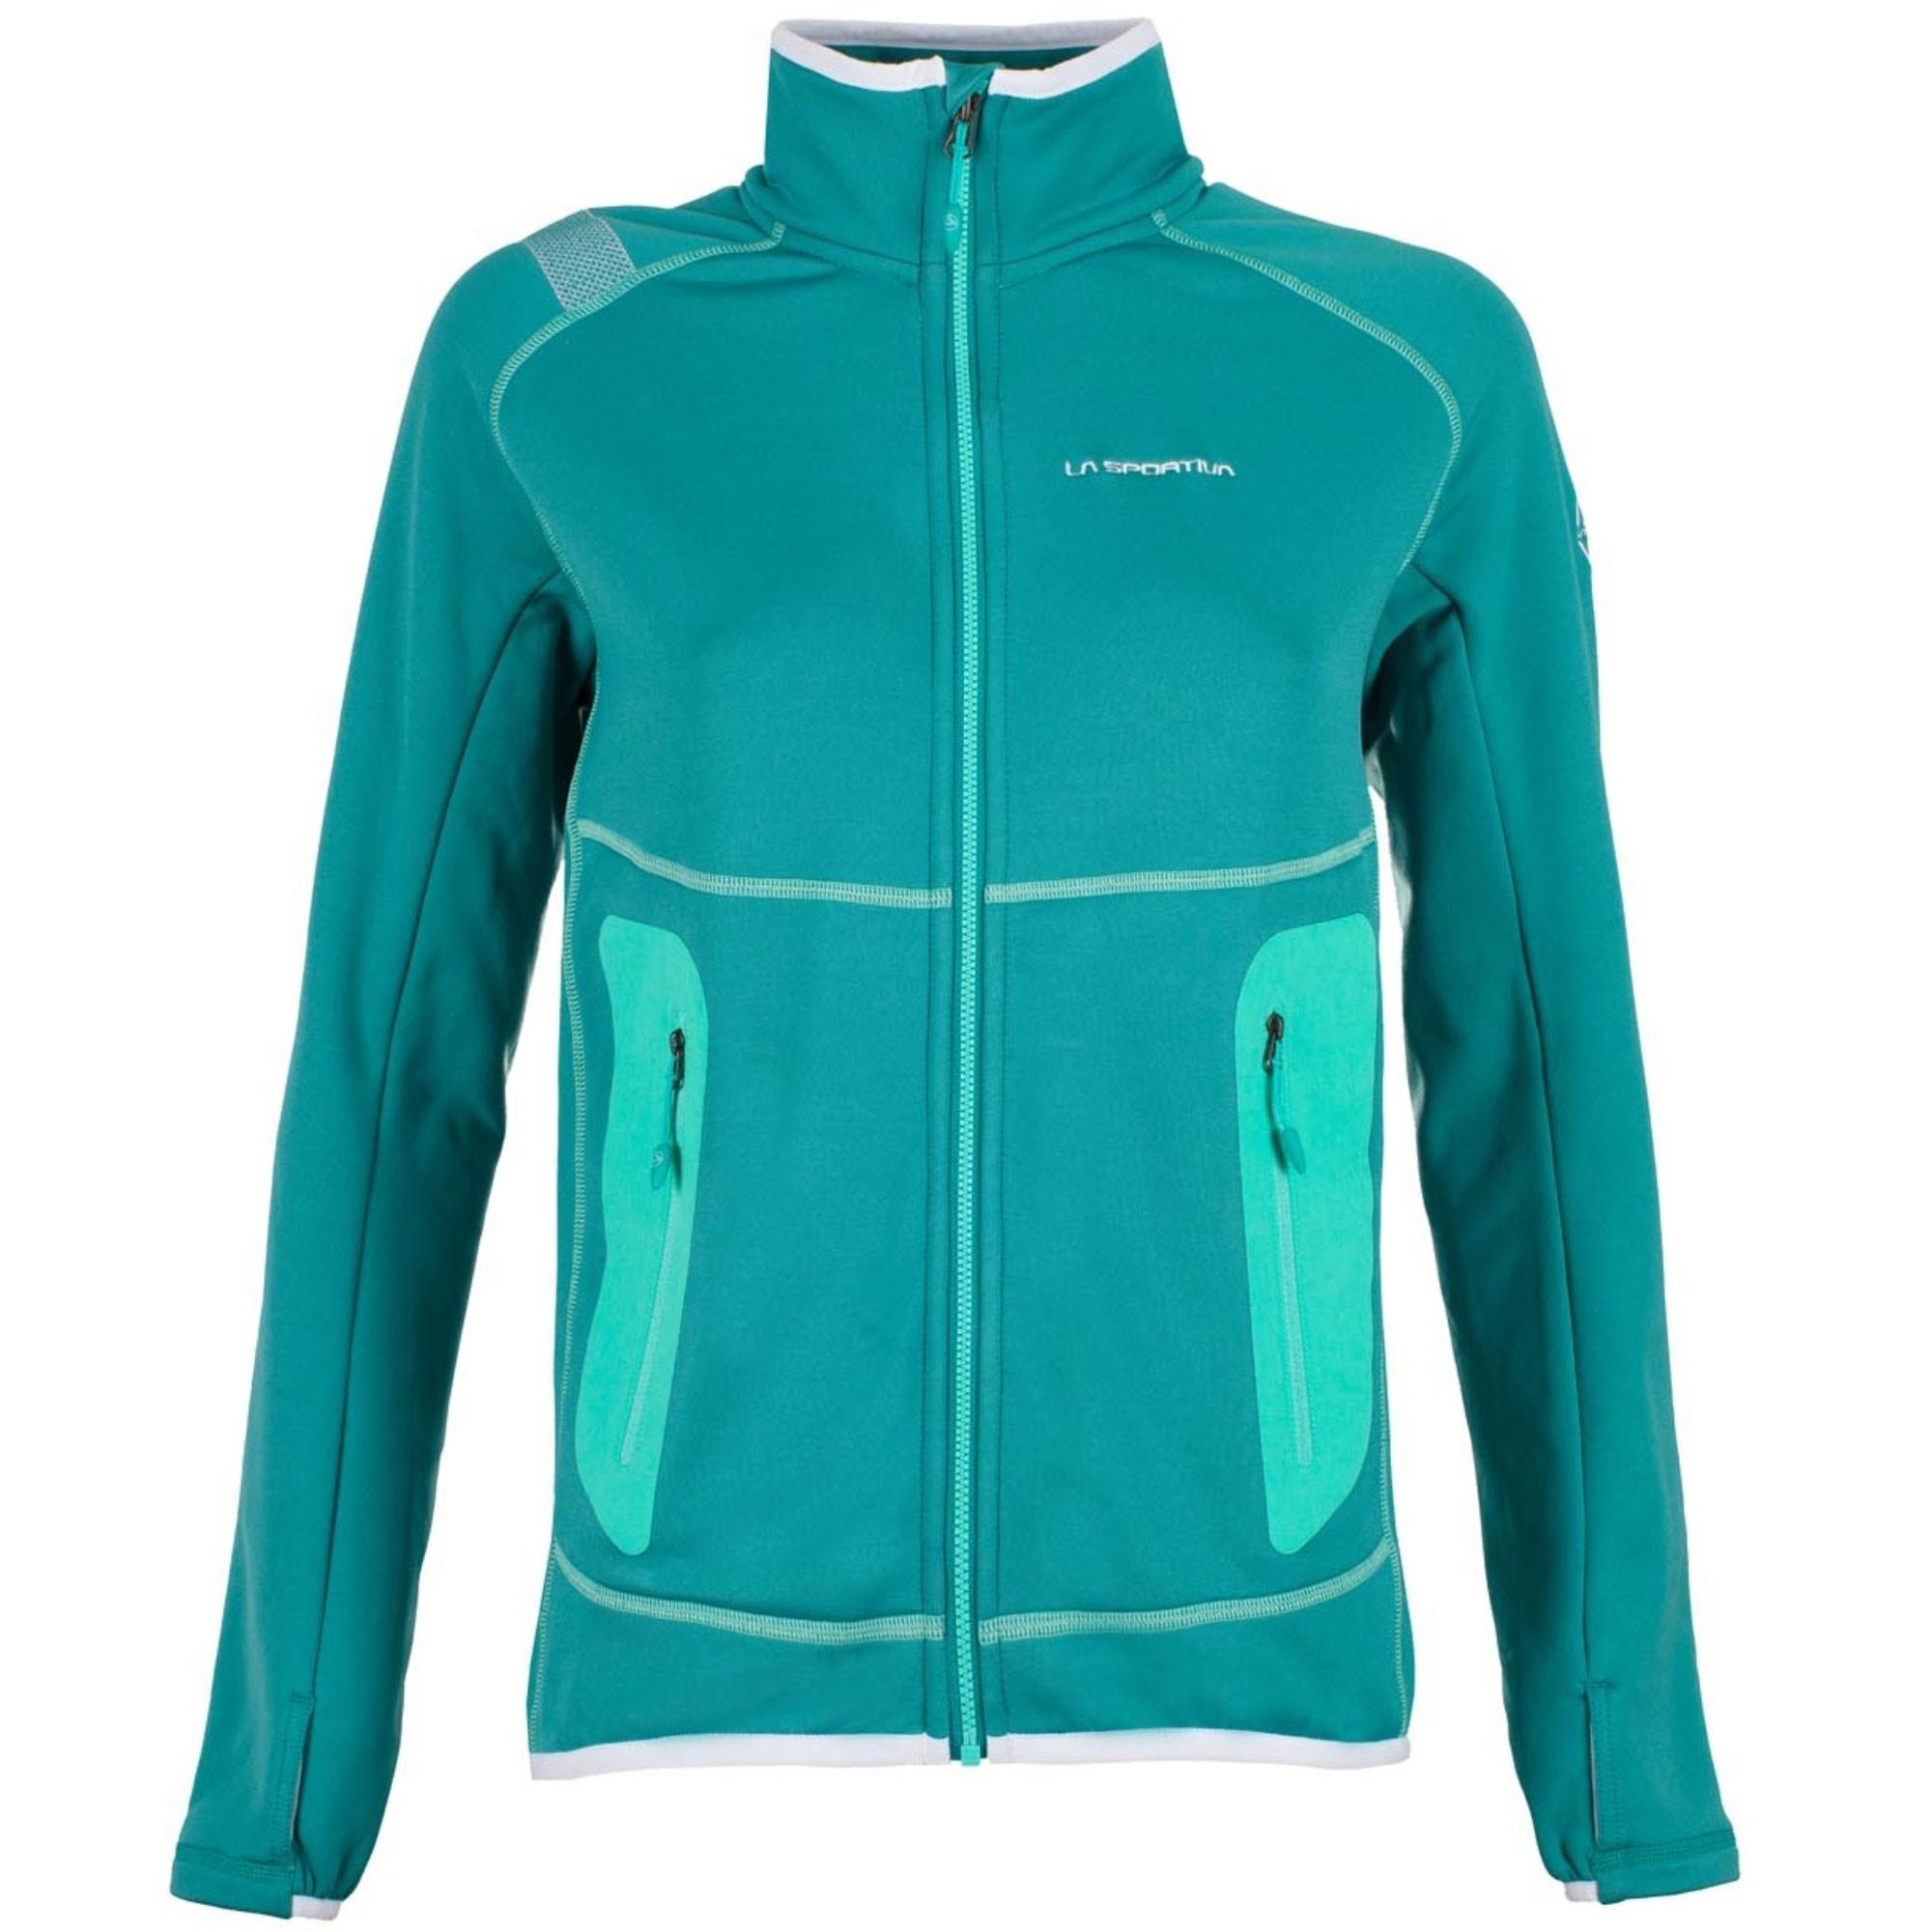 La-Sportiva-Iris-2.0-Jacket-Emerald-W17